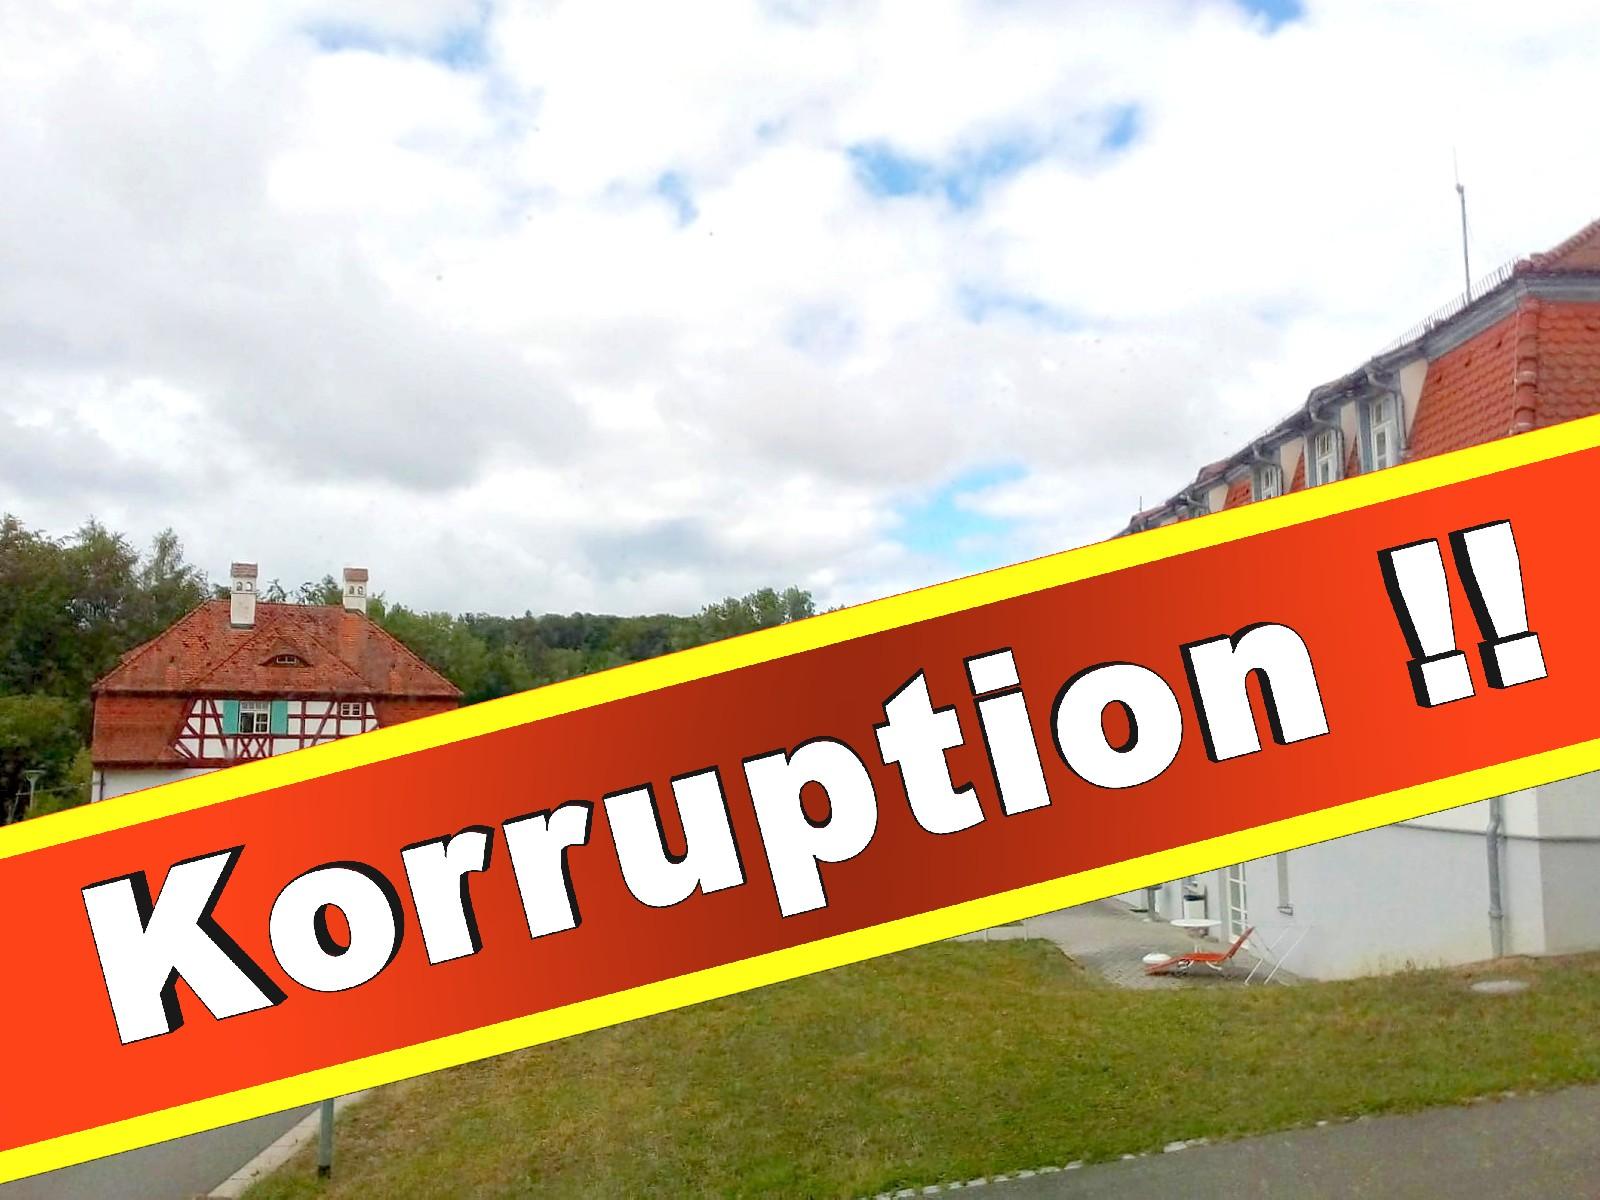 Bezirksklinikum Obermain Kutzenberg, 96250 Ebensfeld Psychiatrie Polizei Krankenhaus (20)